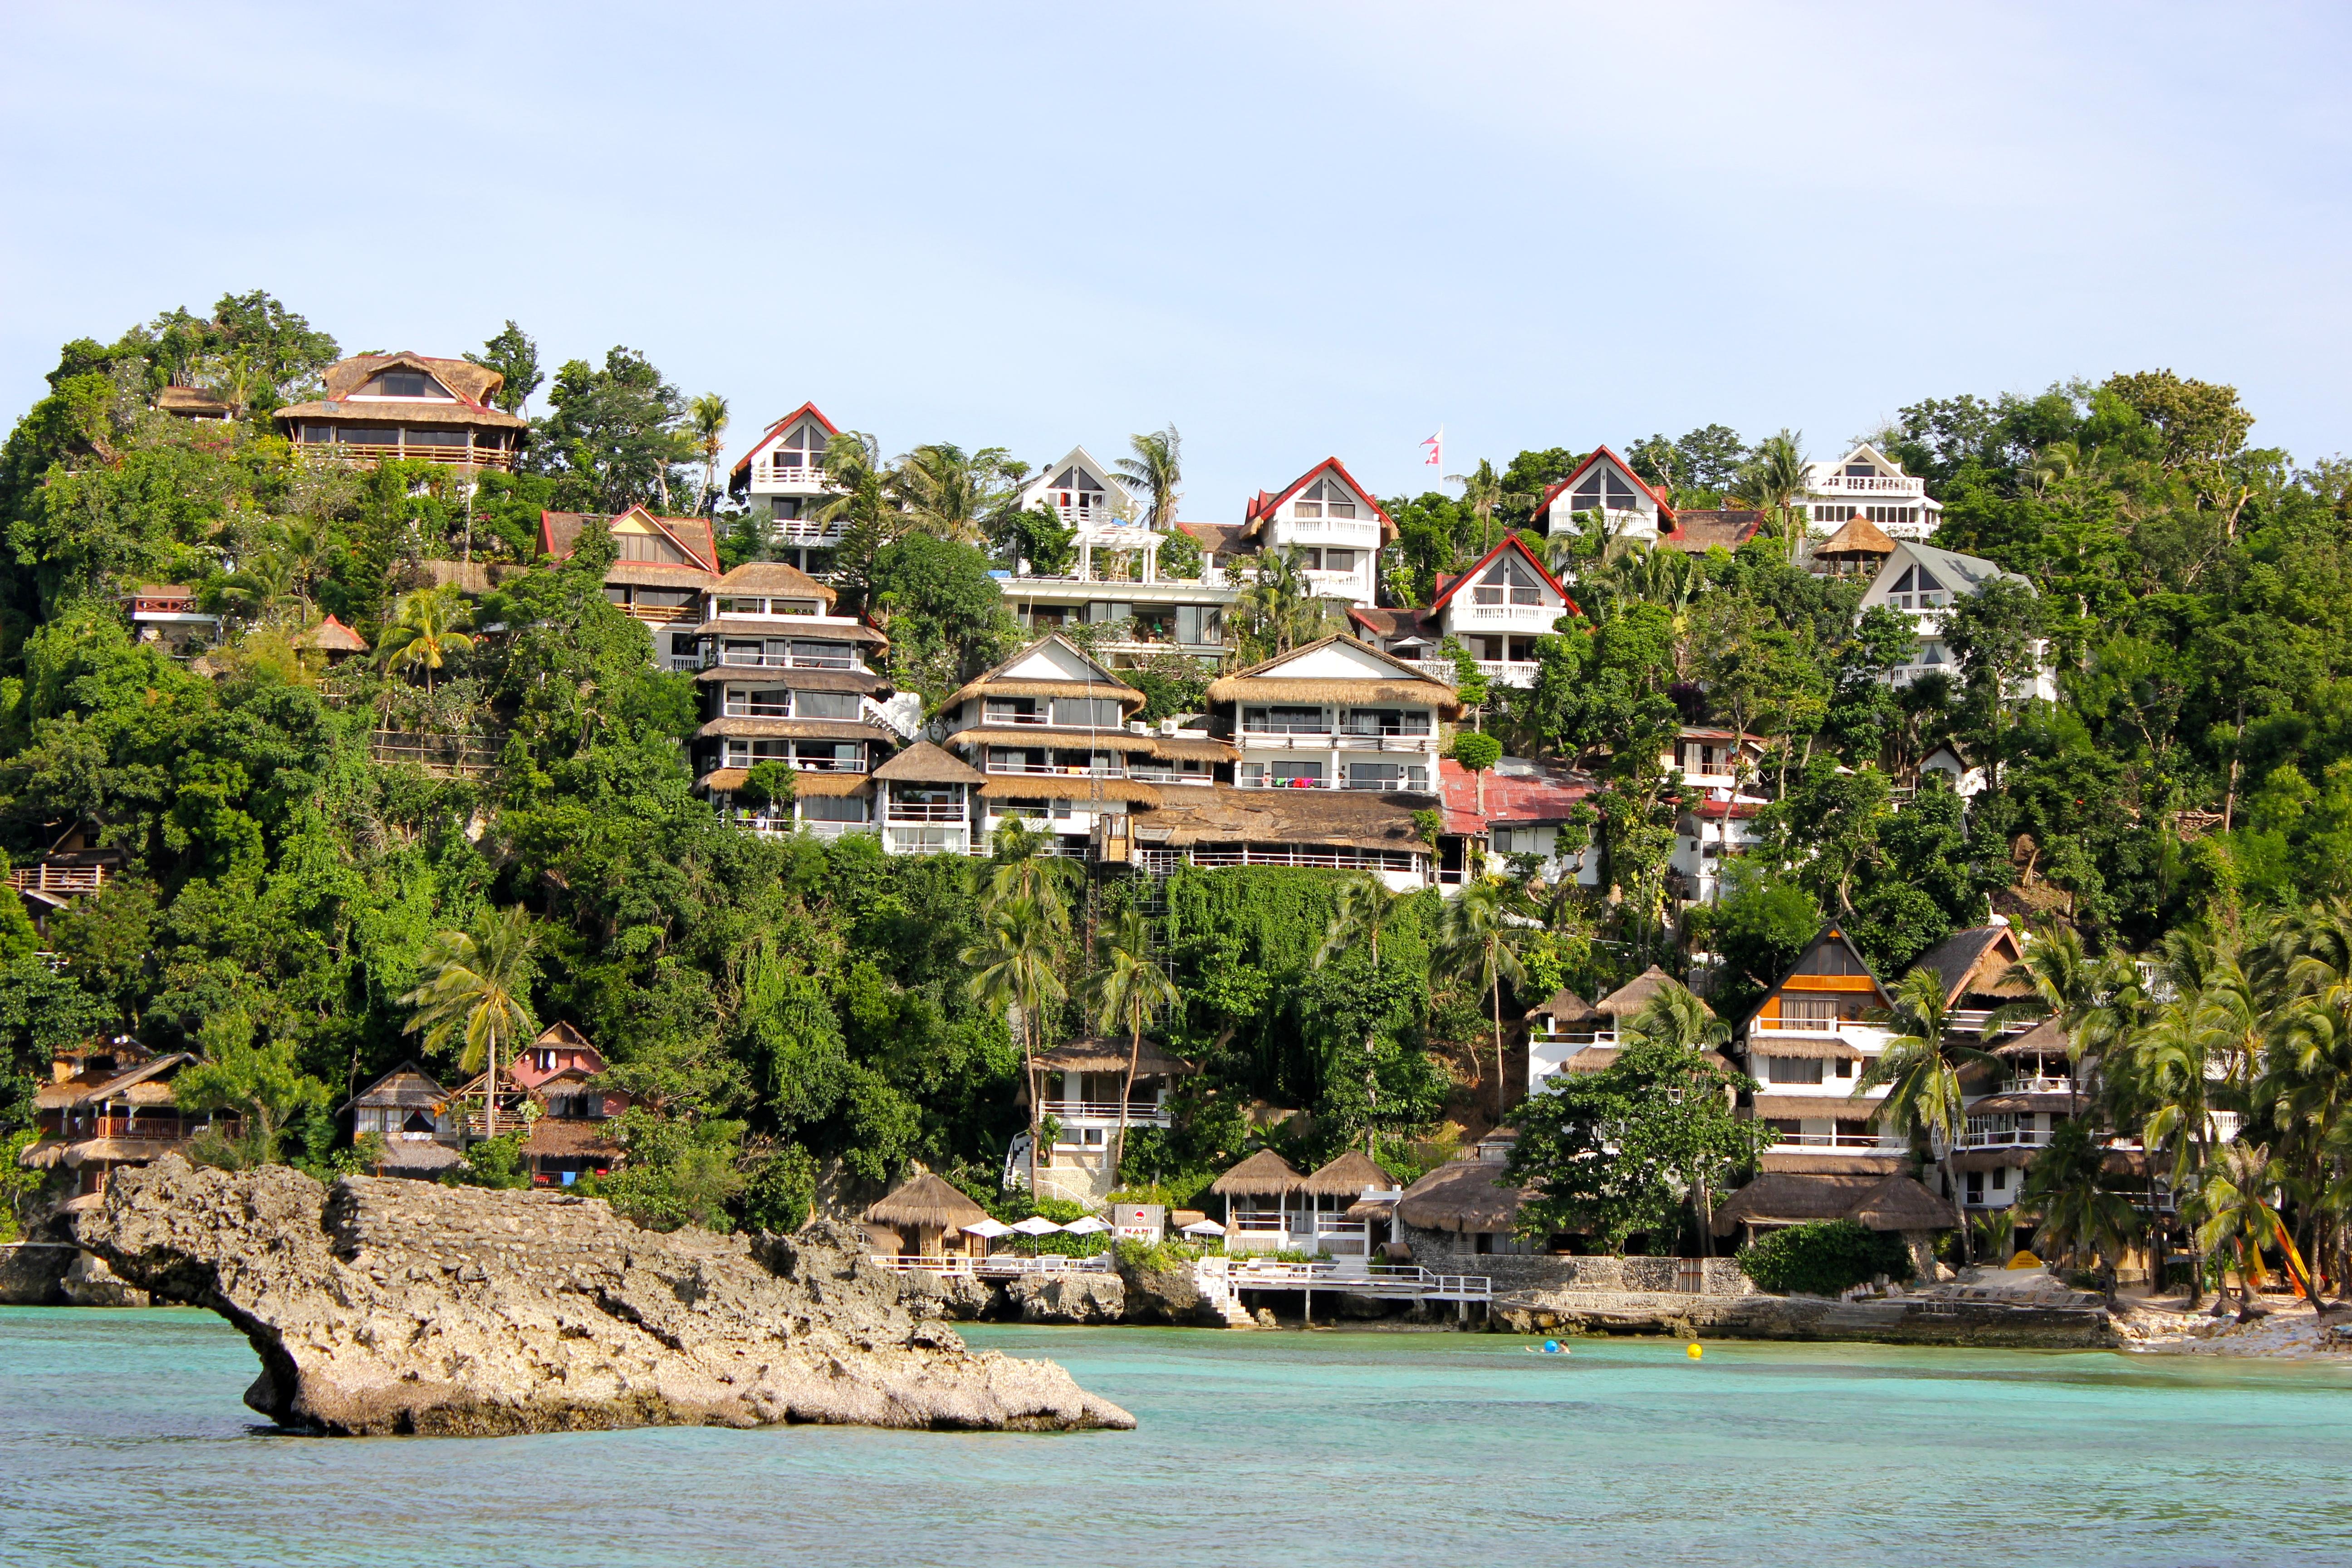 A Rare Glimpse of Paradise: Boracay Island, Philippines